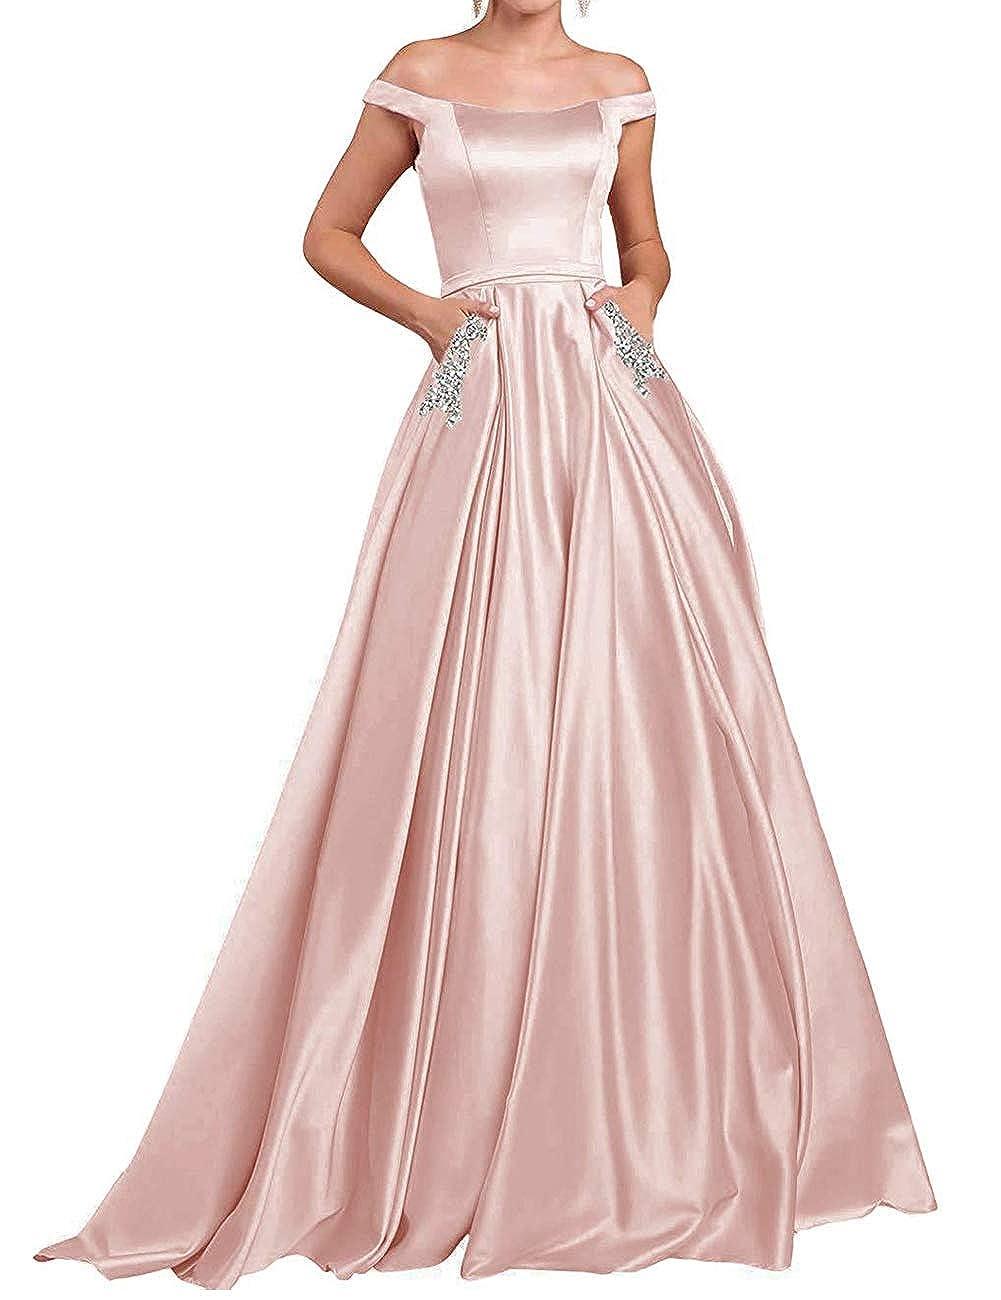 bluesh JAEDEN Prom Dresses Long Formal Evening Gowns with Pocket Off The Shoulder Prom Dress A line Evening Dresses